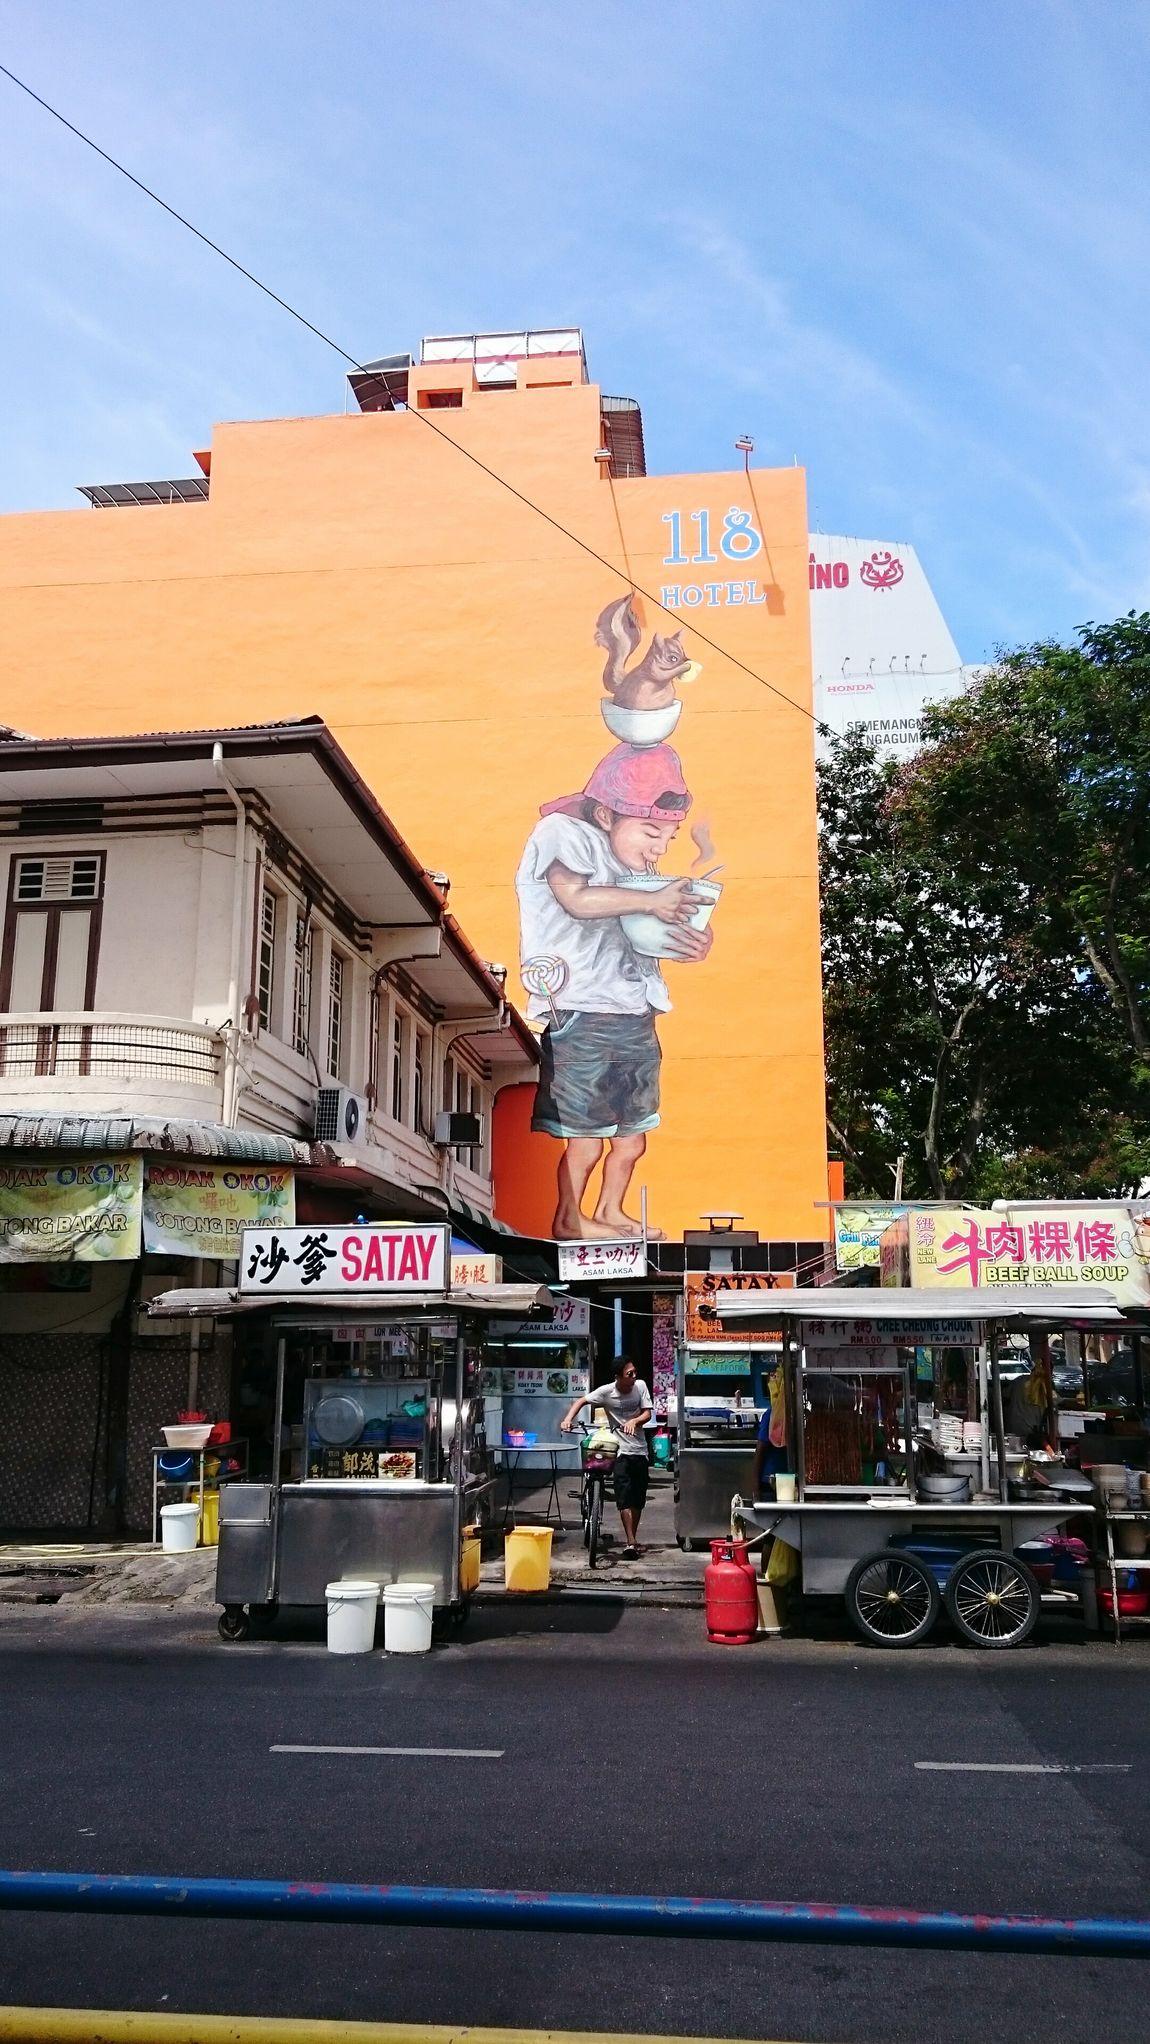 Asian Foods Hawker Food Hawker Centre Penang Macalister Road Penang Streetphotography Streetviews Mural Art Mural Painting Food Stalls